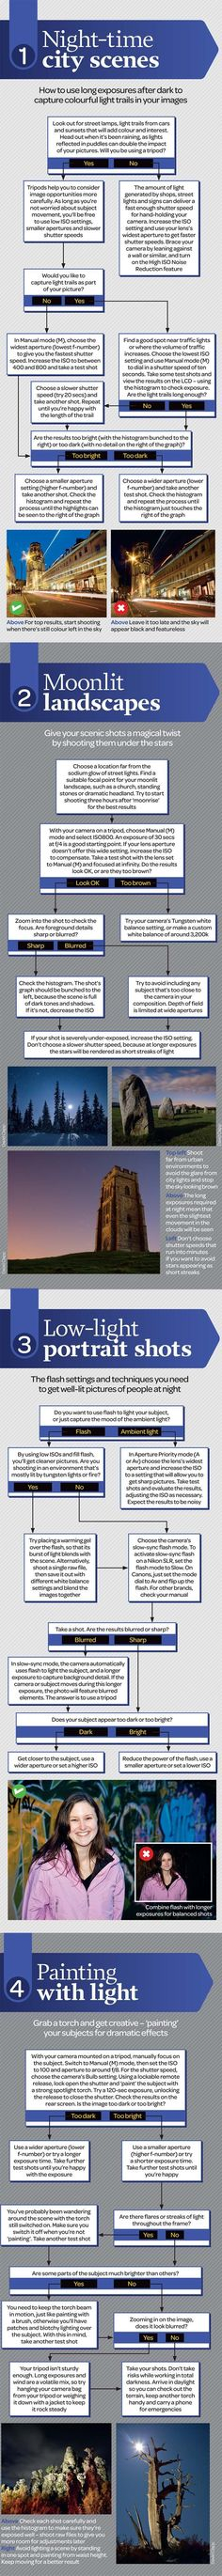 Free night photography cheat sheet: how to shoot popular low-light scenes | Digital Camera World